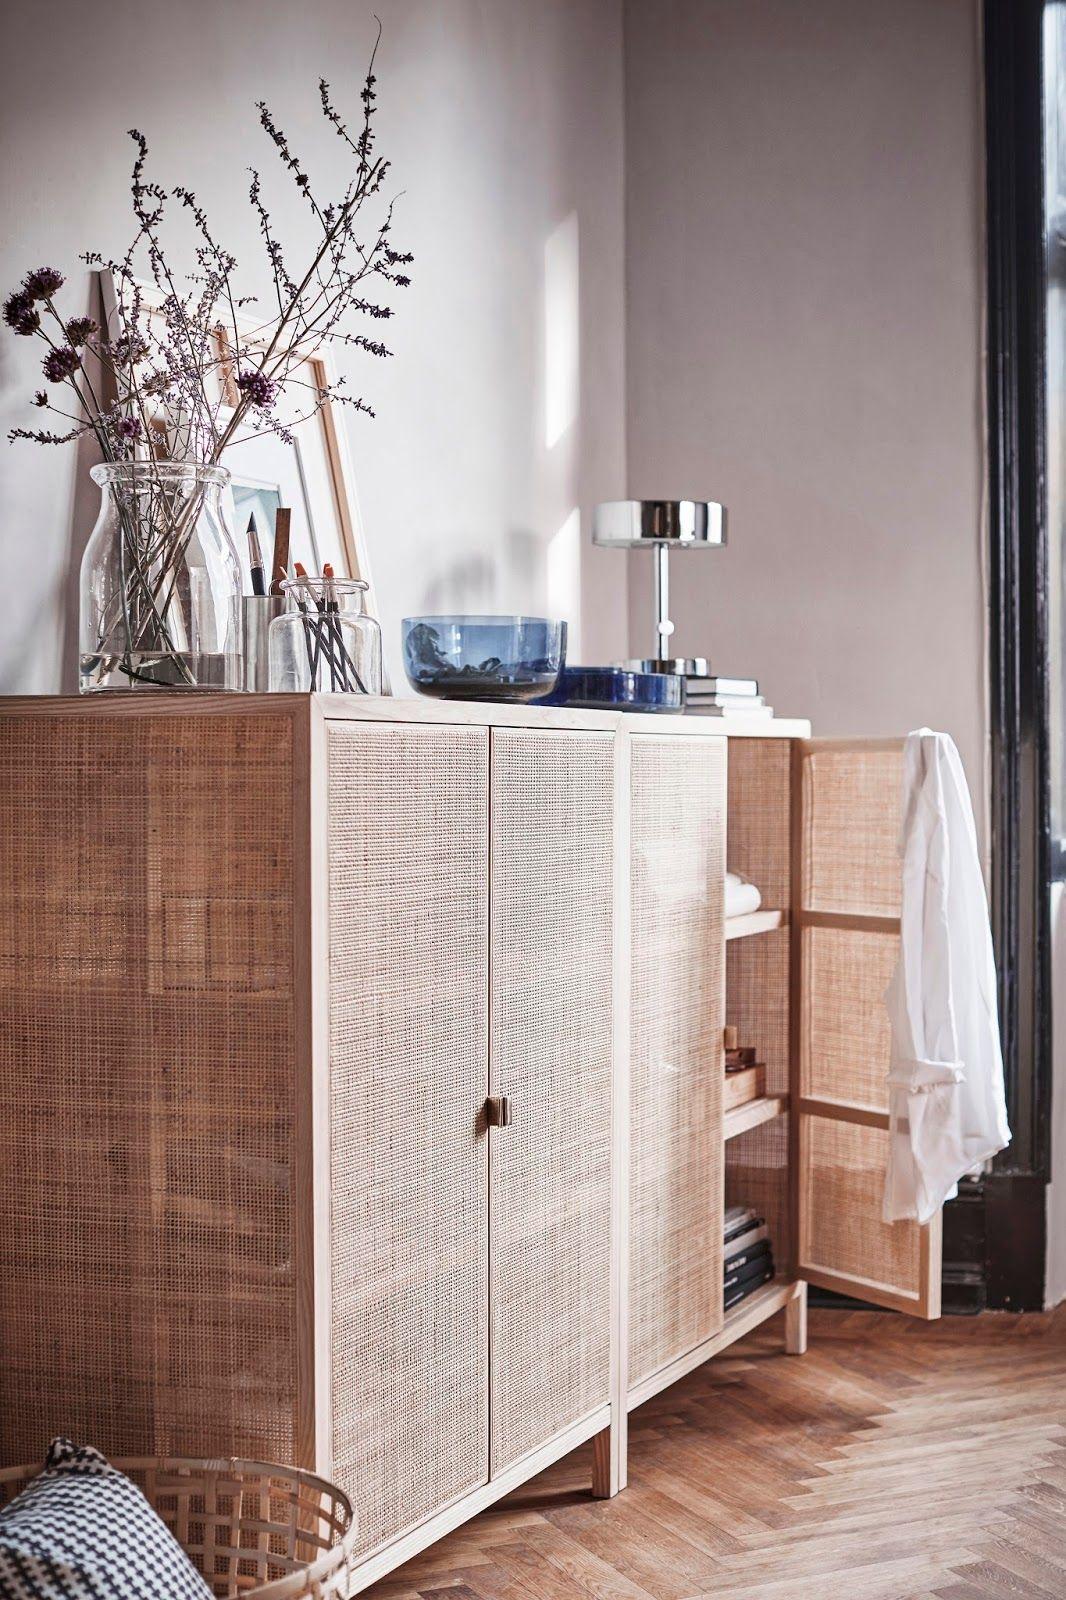 IKEA Stockholm 2017 Kollektion | Ikea stockholm, Stockholm and Haus